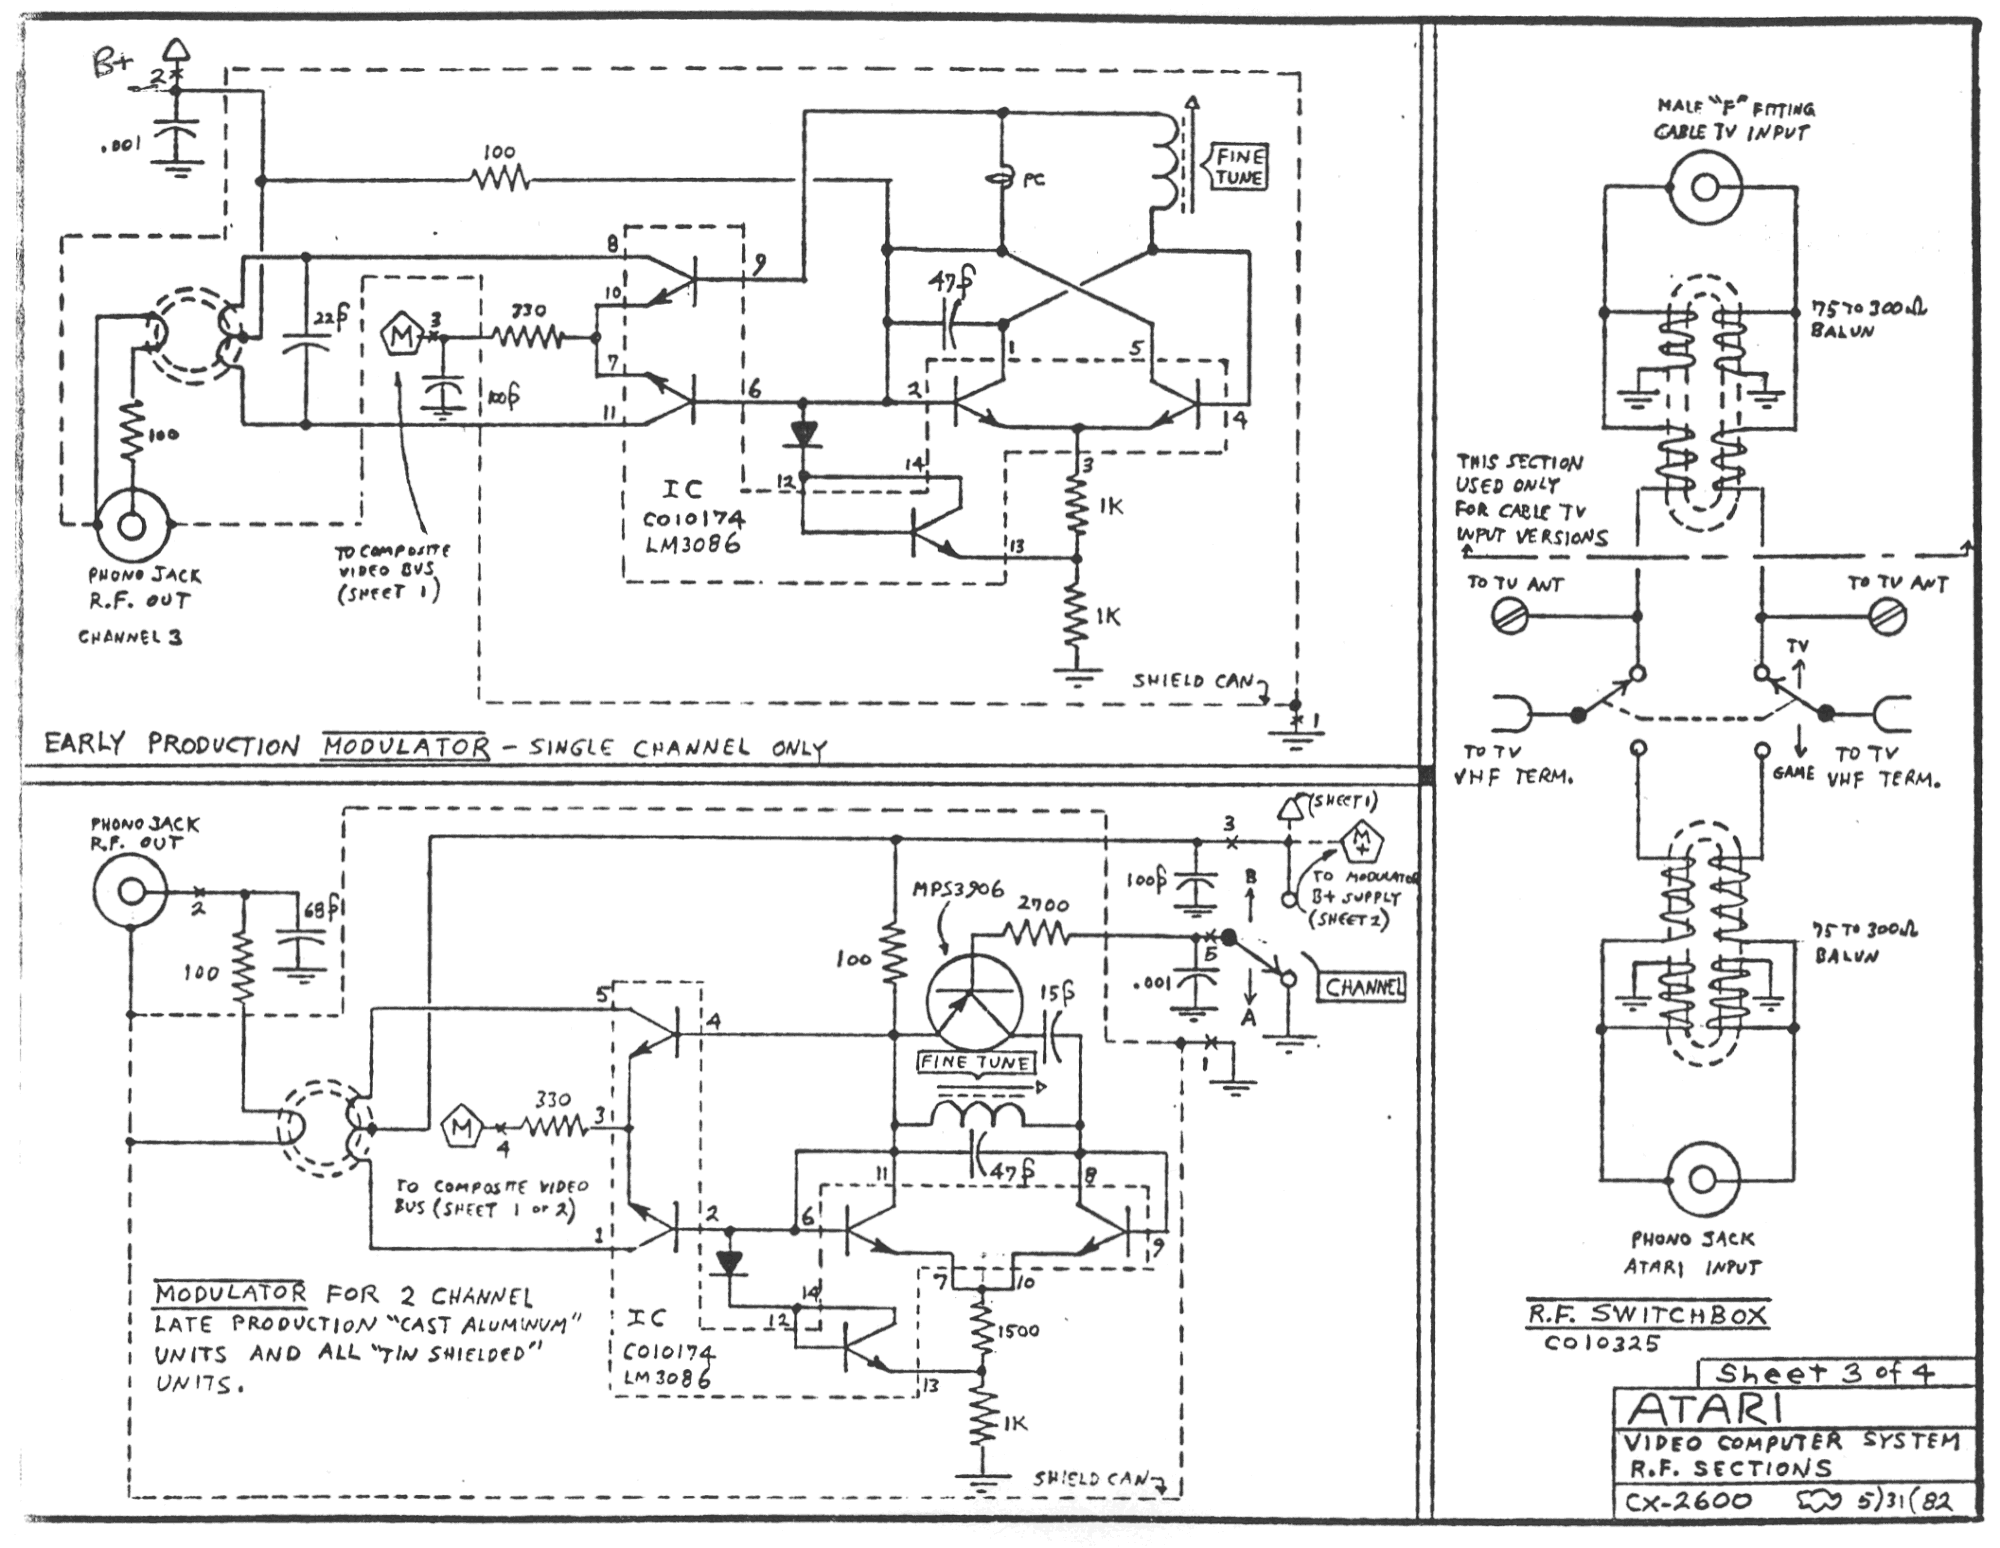 atari 2600 rf sections schematic